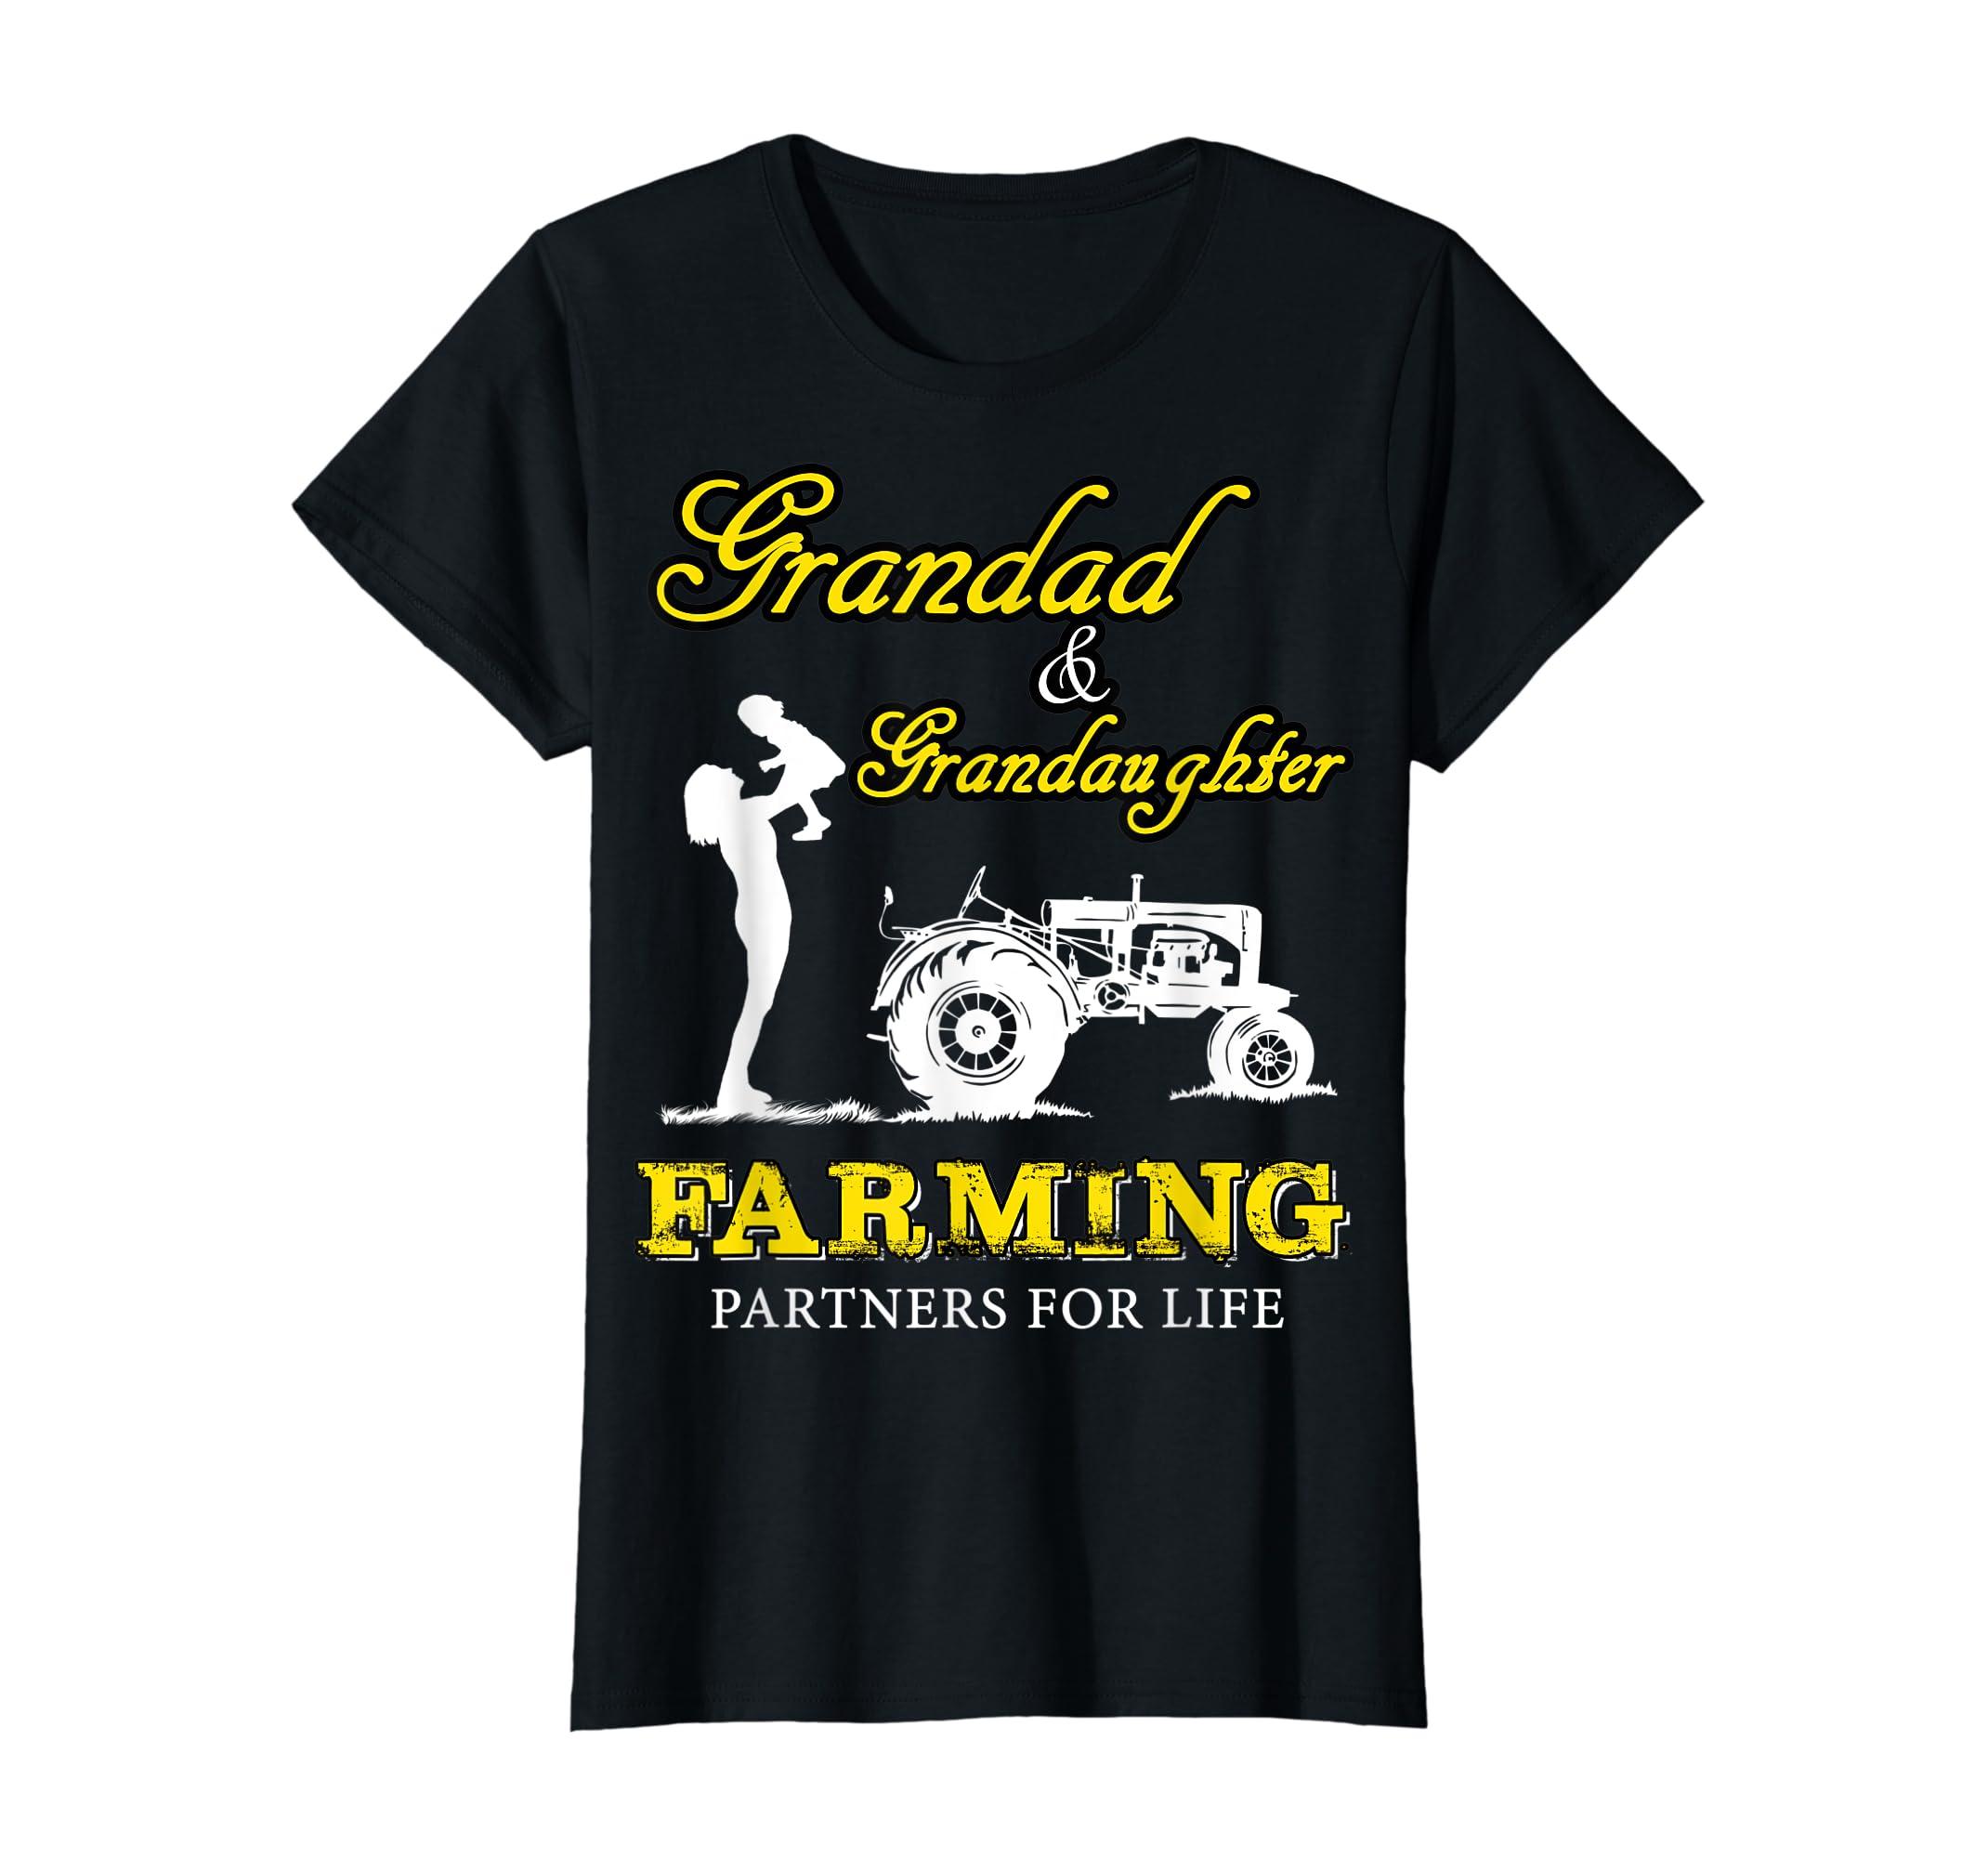 Grandad and Grandaughter Farming Partner For Life Shirt T-Shirt-Women's T-Shirt-Black